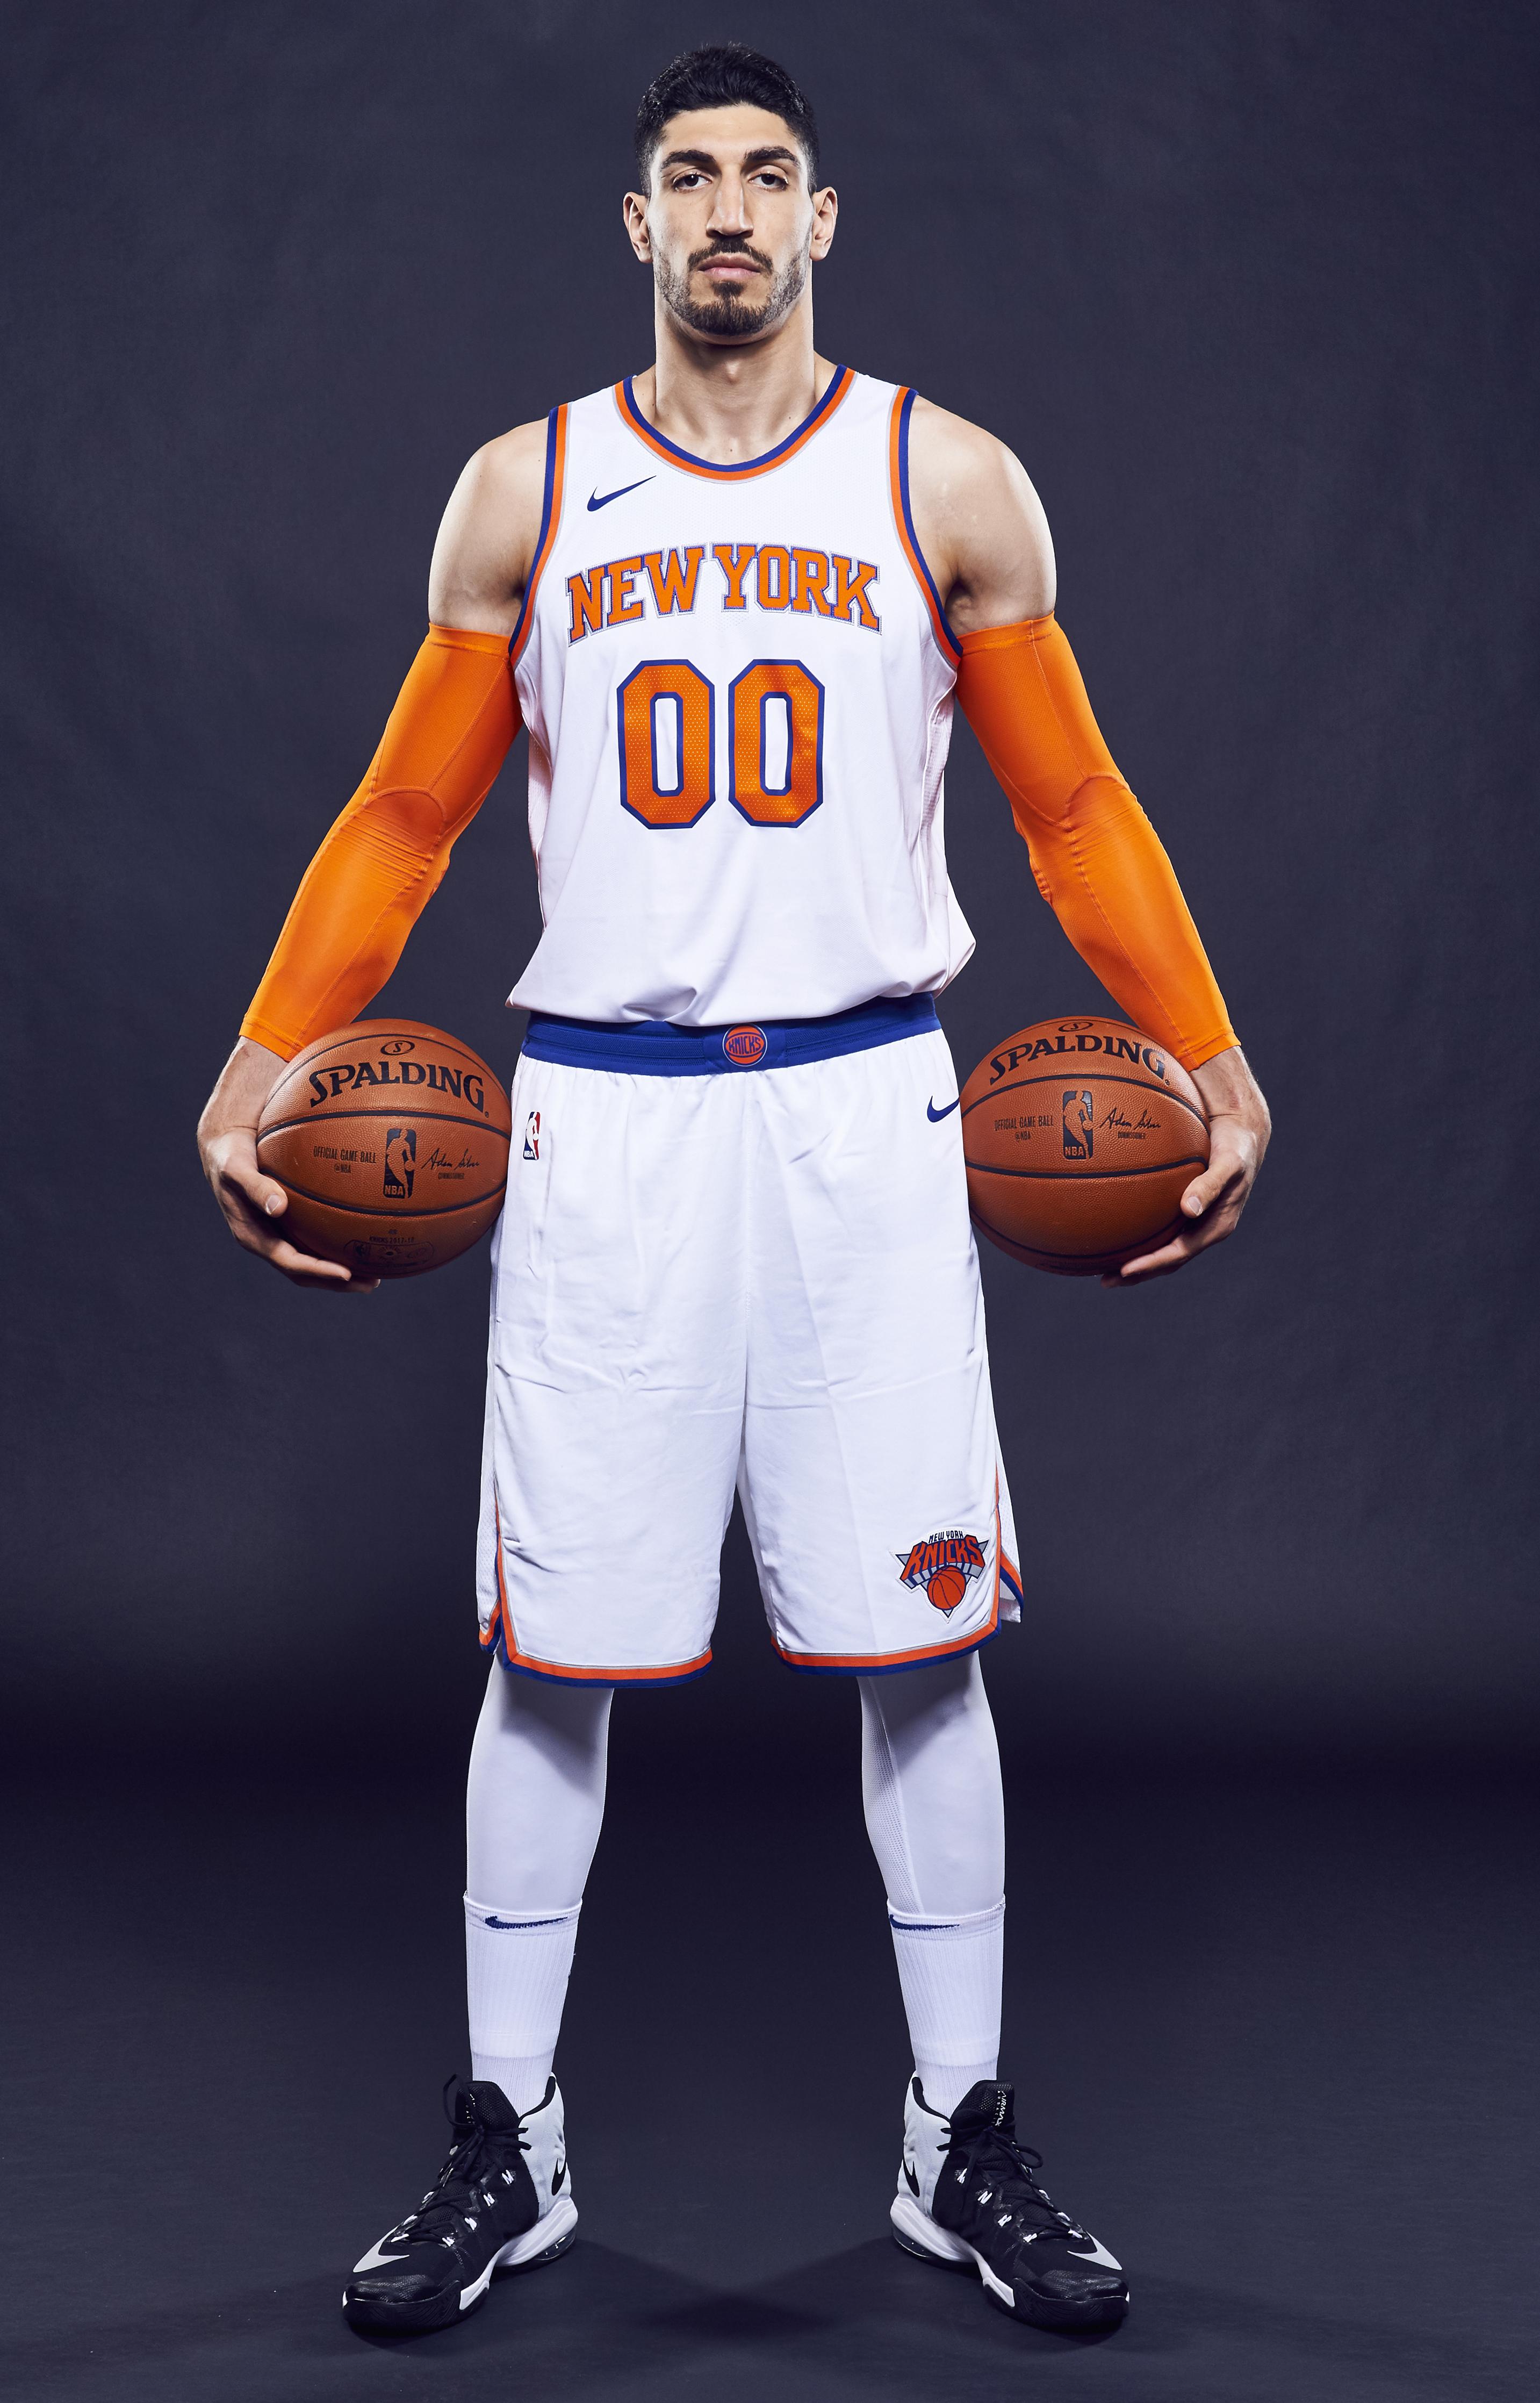 New York Knicks: New York Knicks: Ranking The Top 10 Players On 2017-18